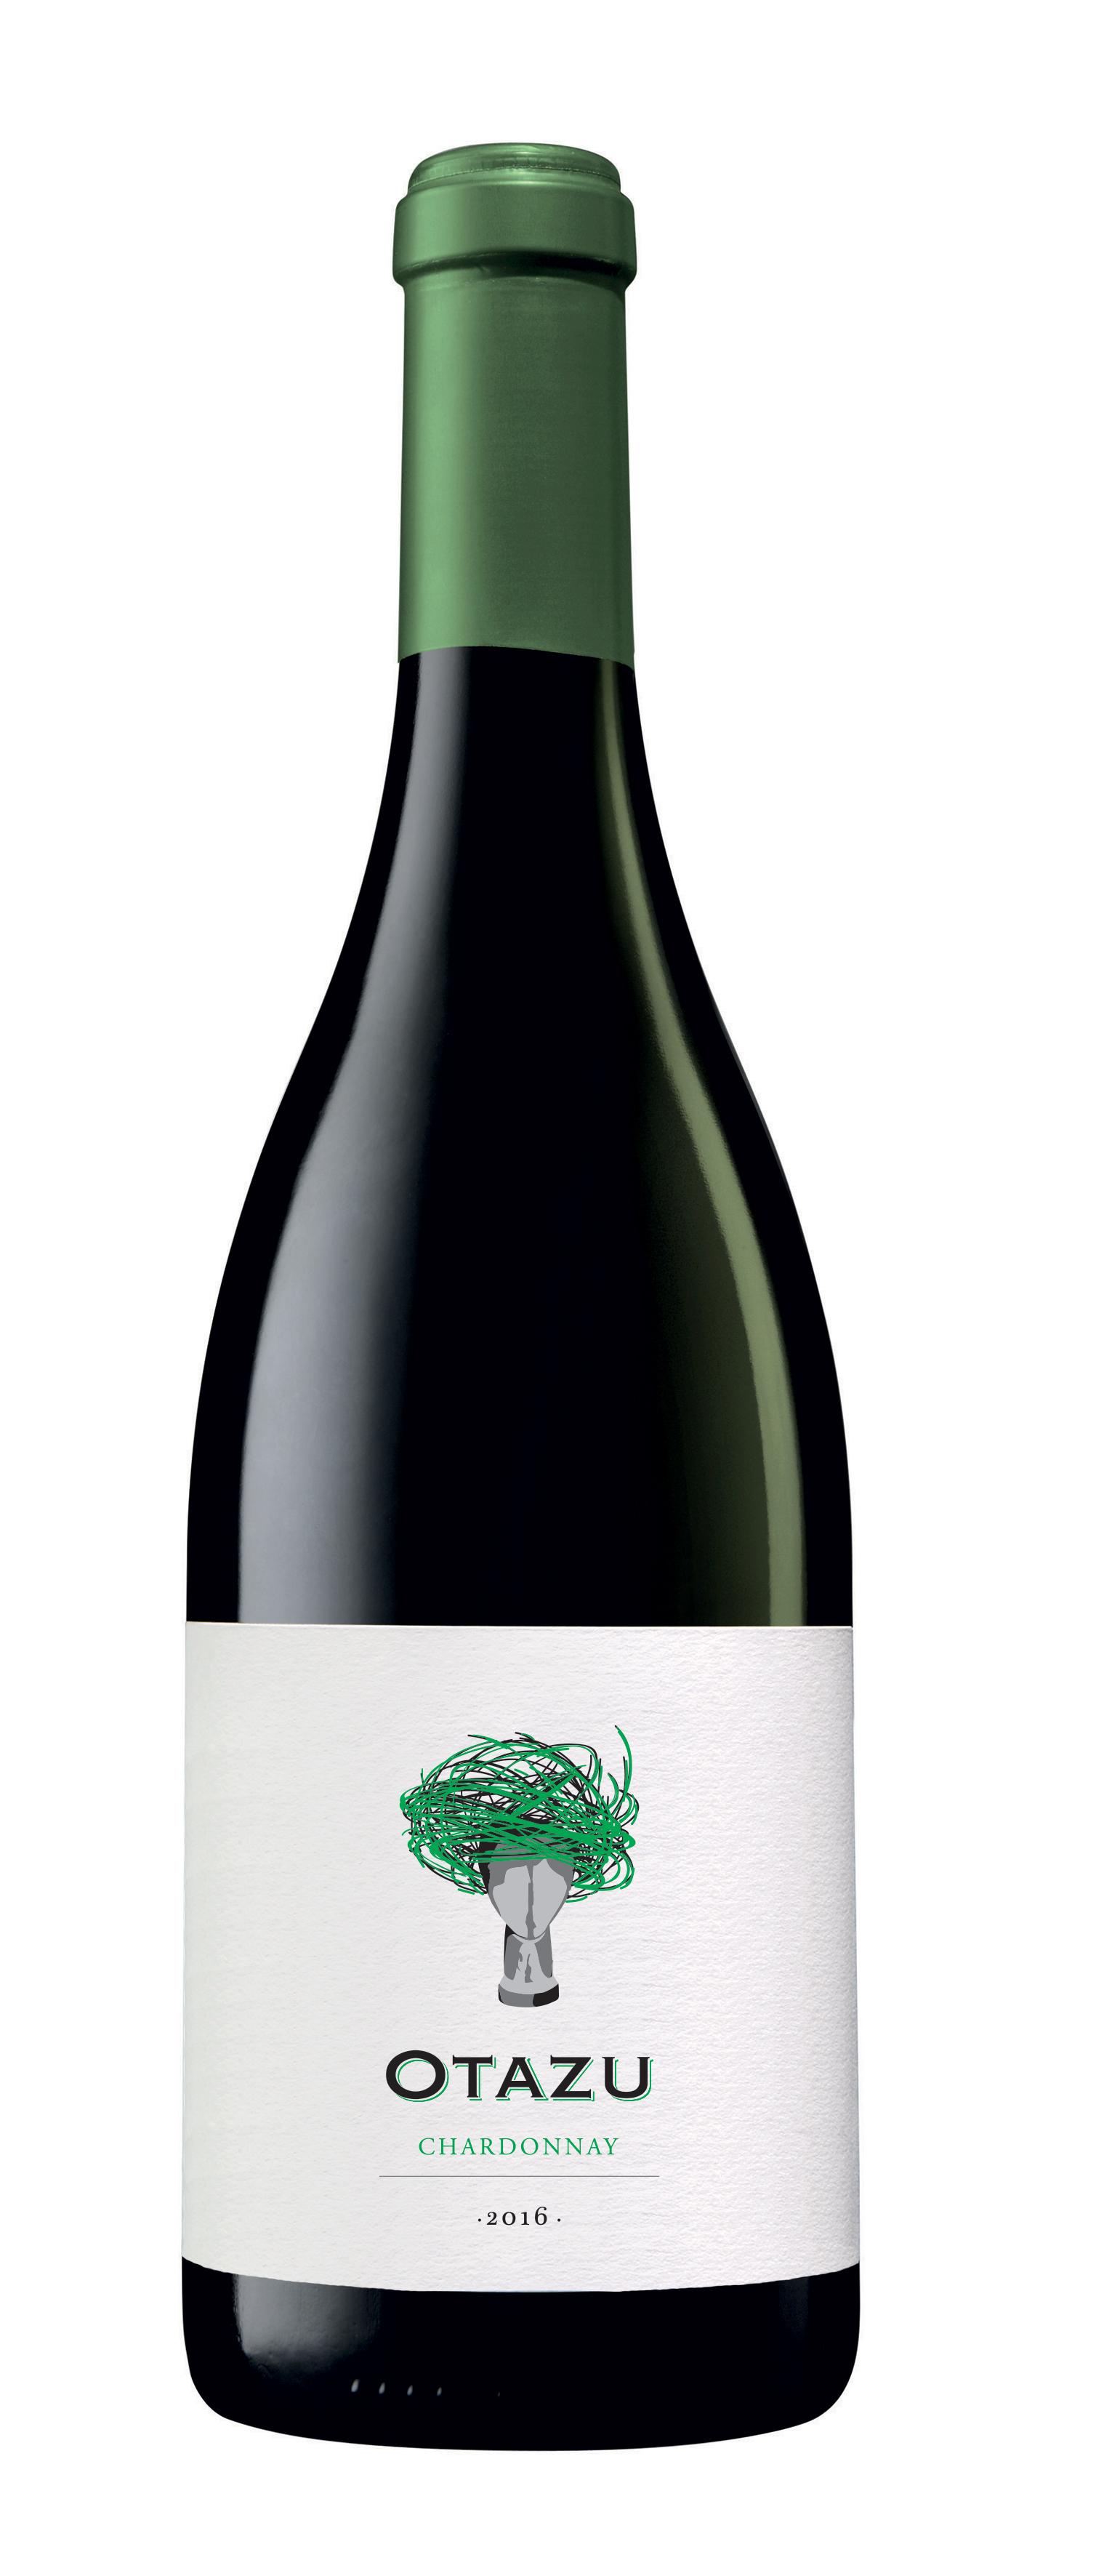 Otazu Chardonnay 2016